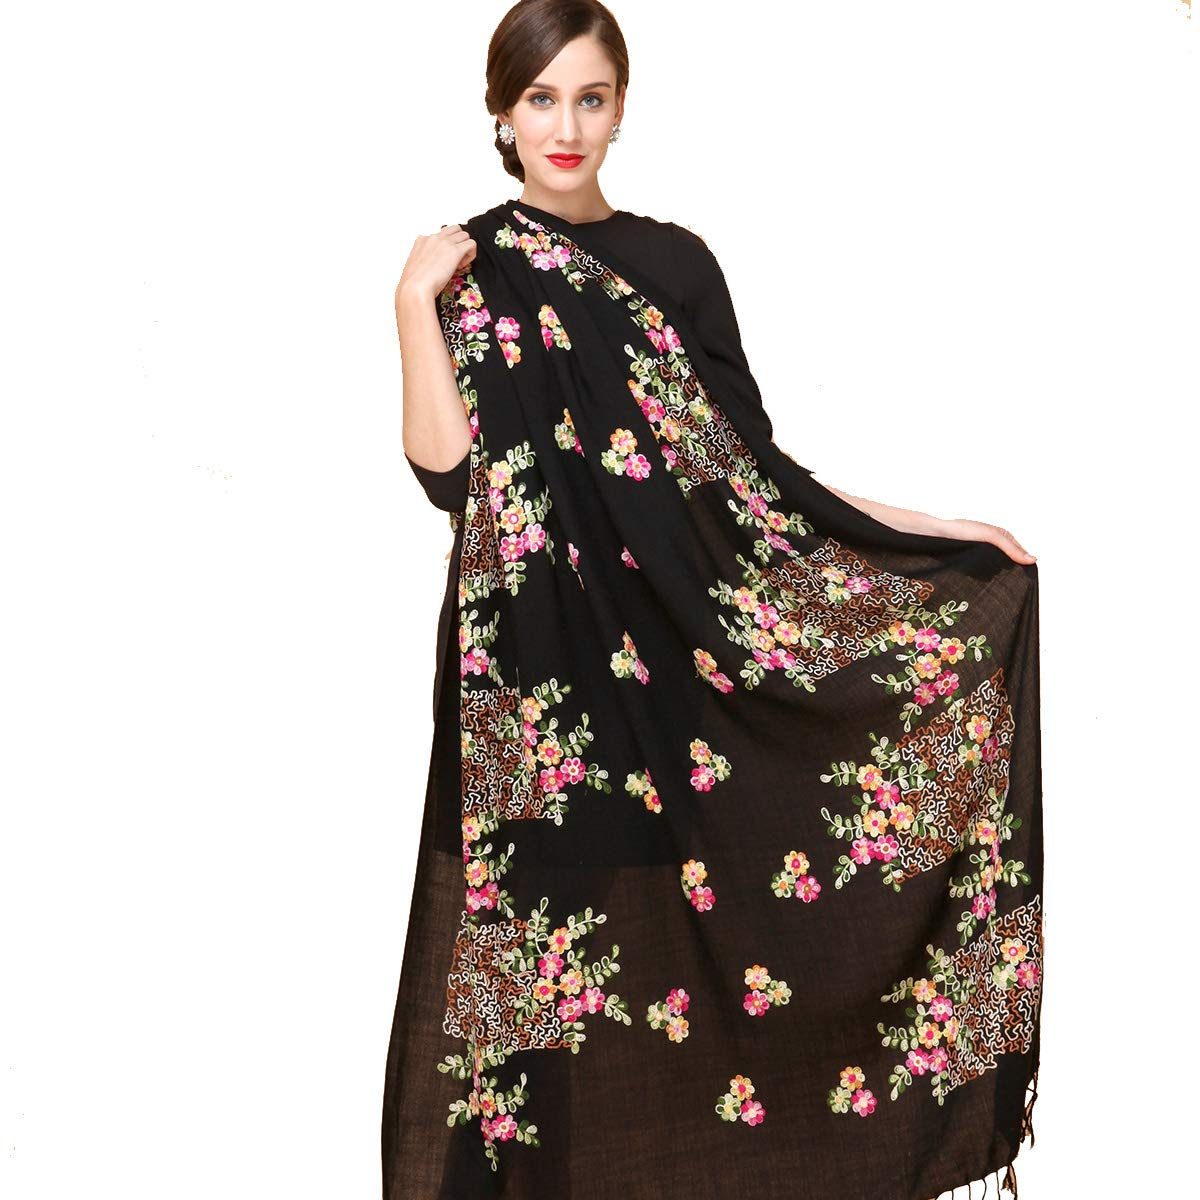 DANA XU Embroidery 100% Pure Wool Pashmina Shawls and Wraps (Black) by DANA XU